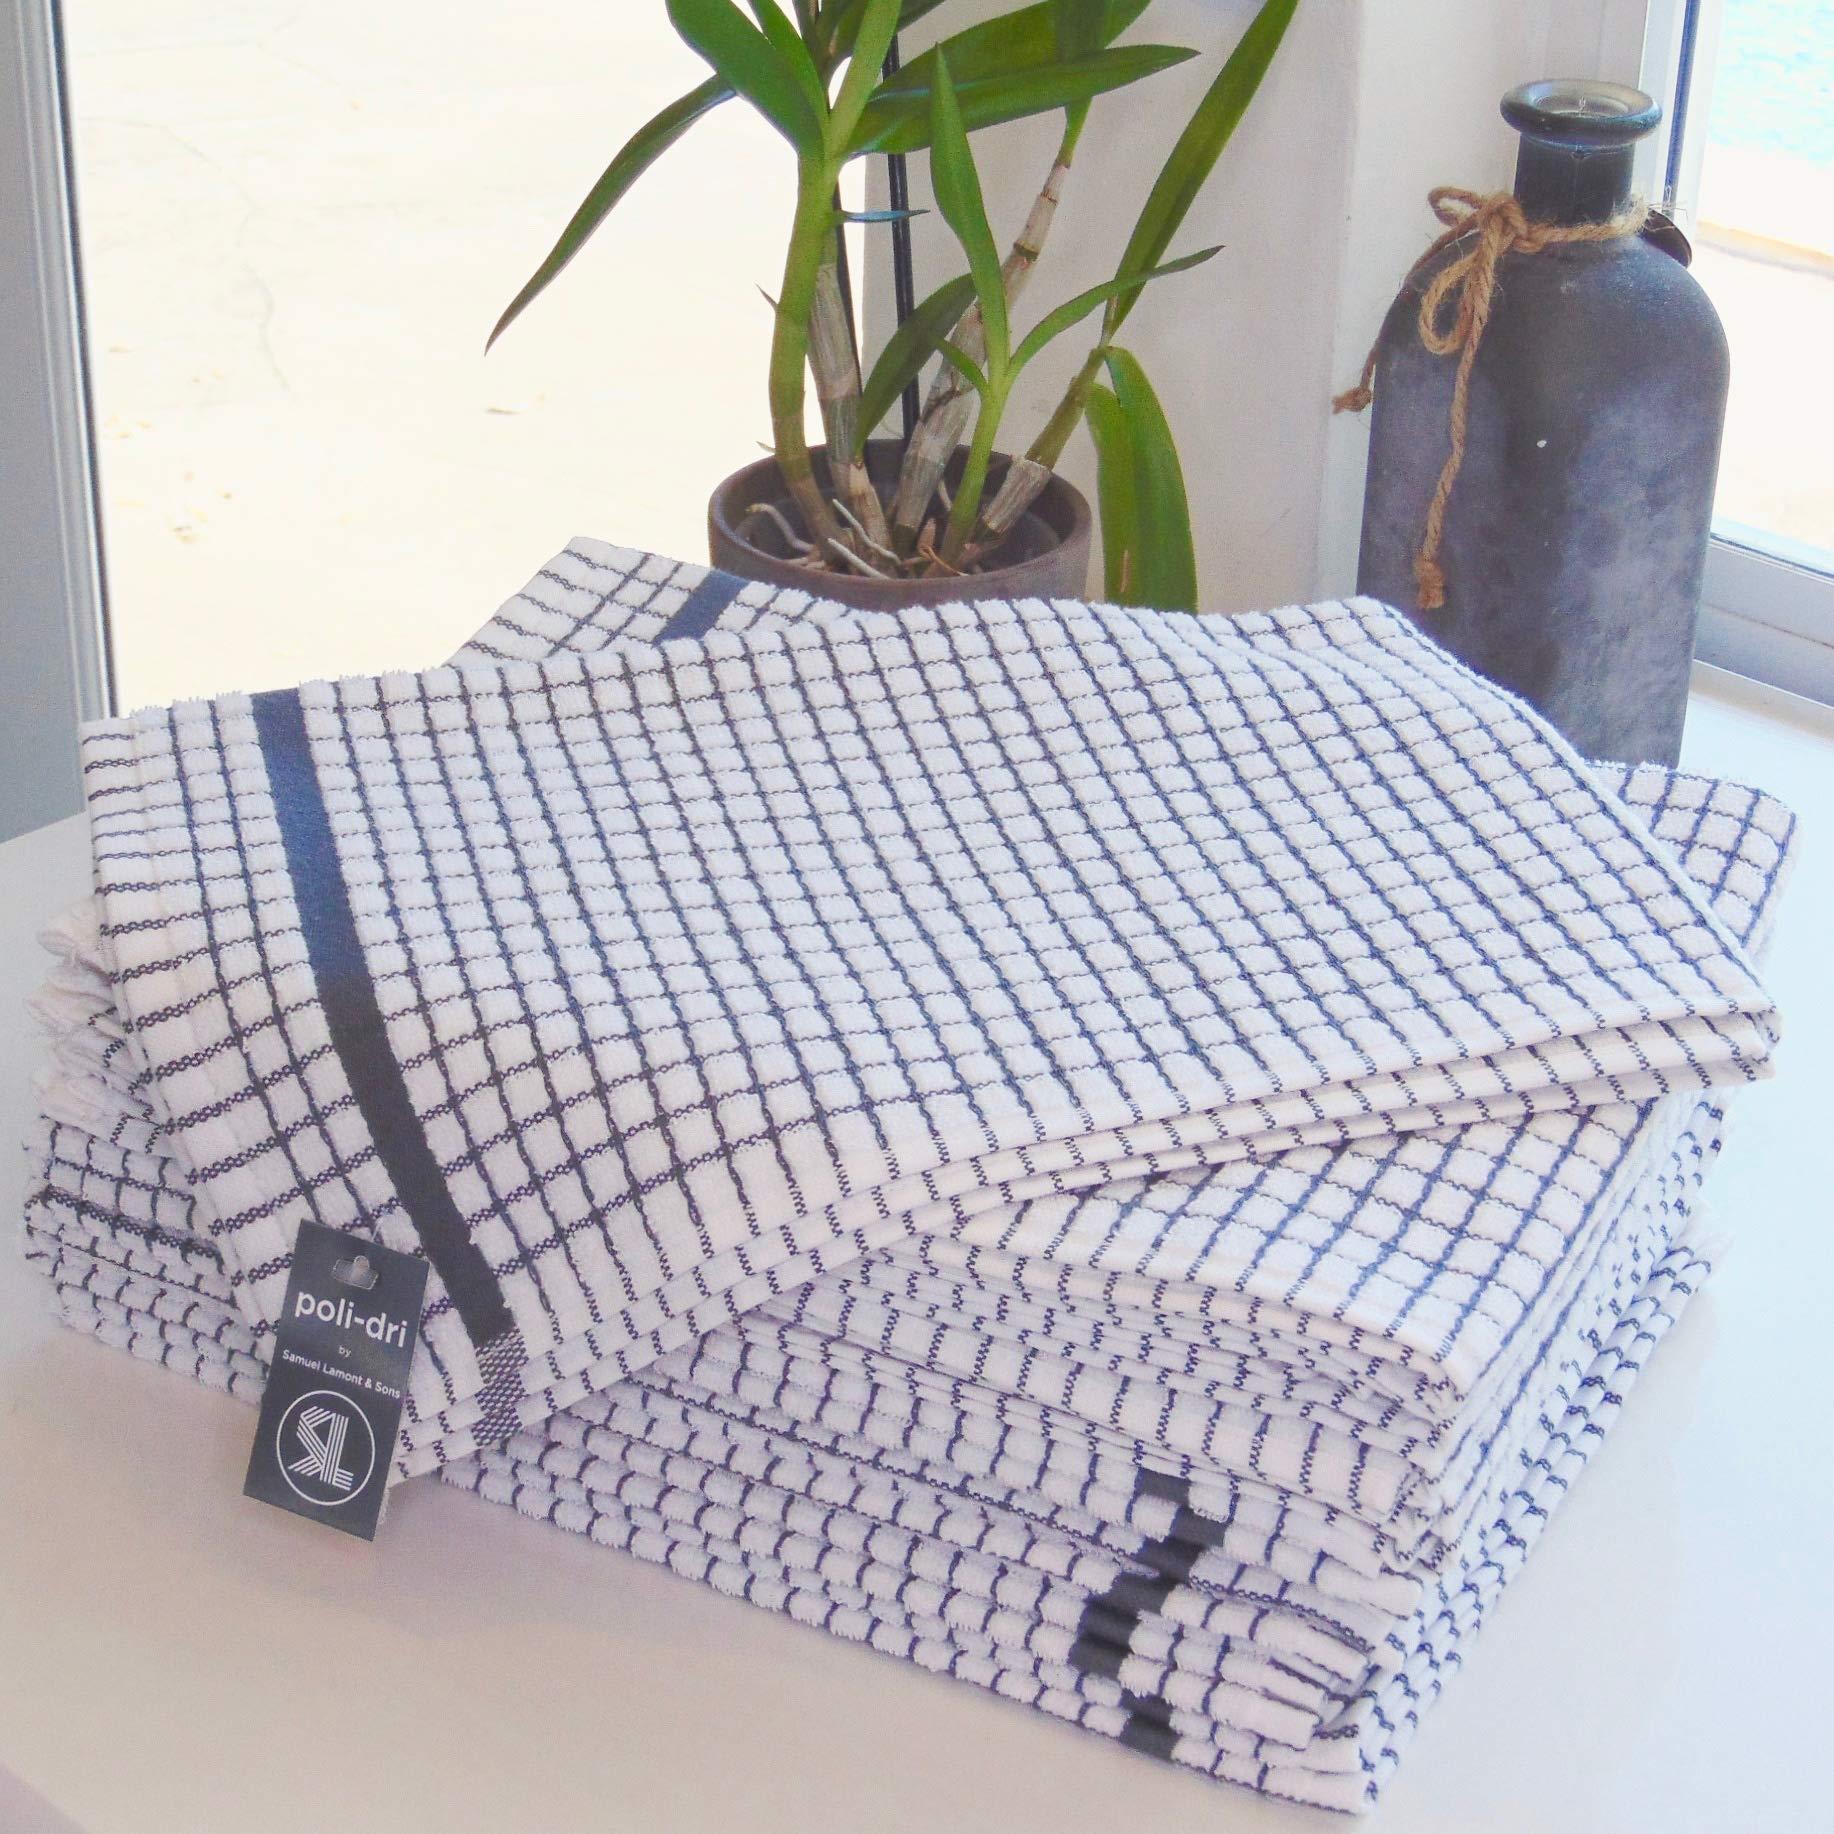 poli-dri New Samuel Lamont Authentic Kitchen Tea Towels (Charcoal, 12 Pack) by poli-dri